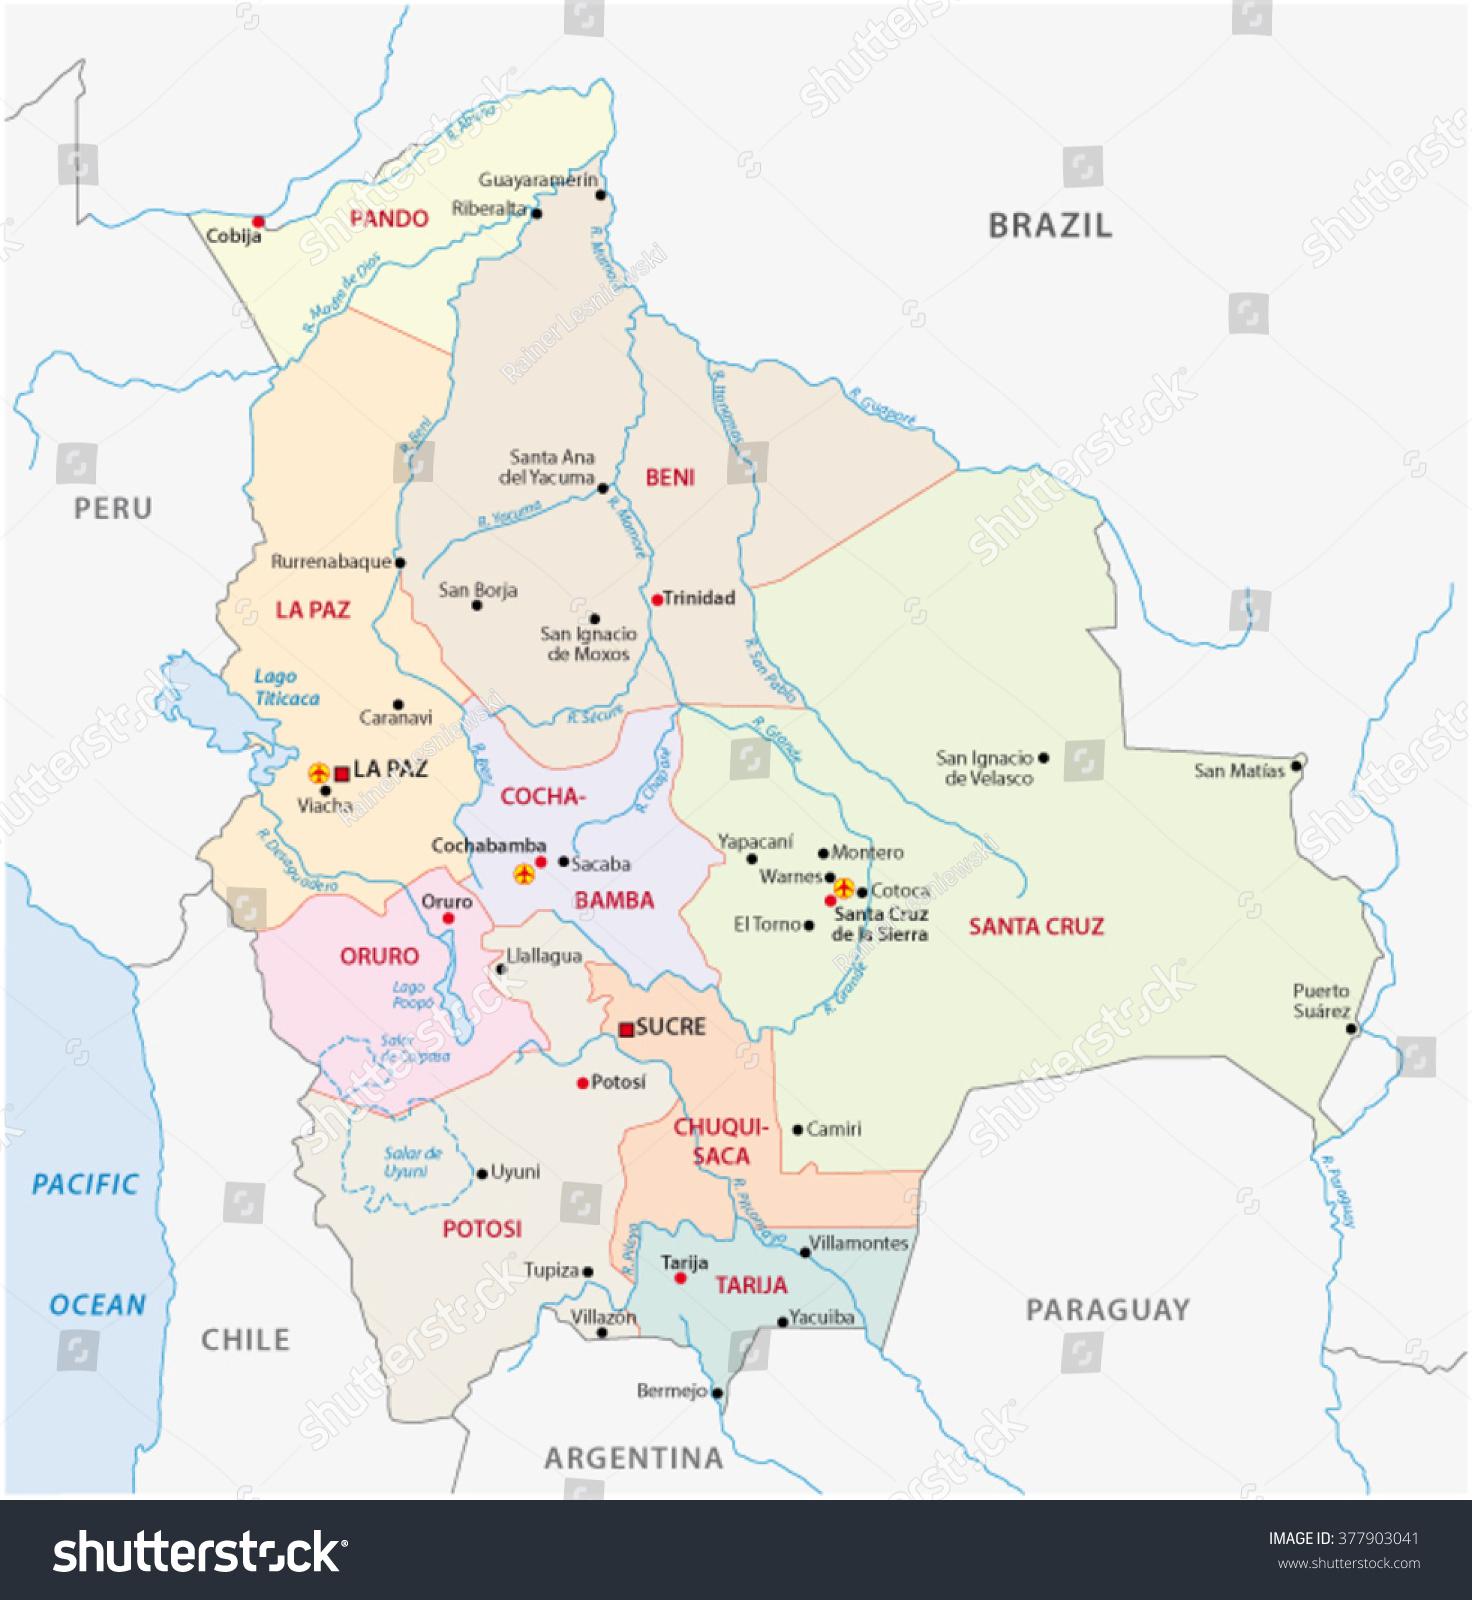 Bolivia Administrative Map Stock Vector 2018 377903041 Shutterstock